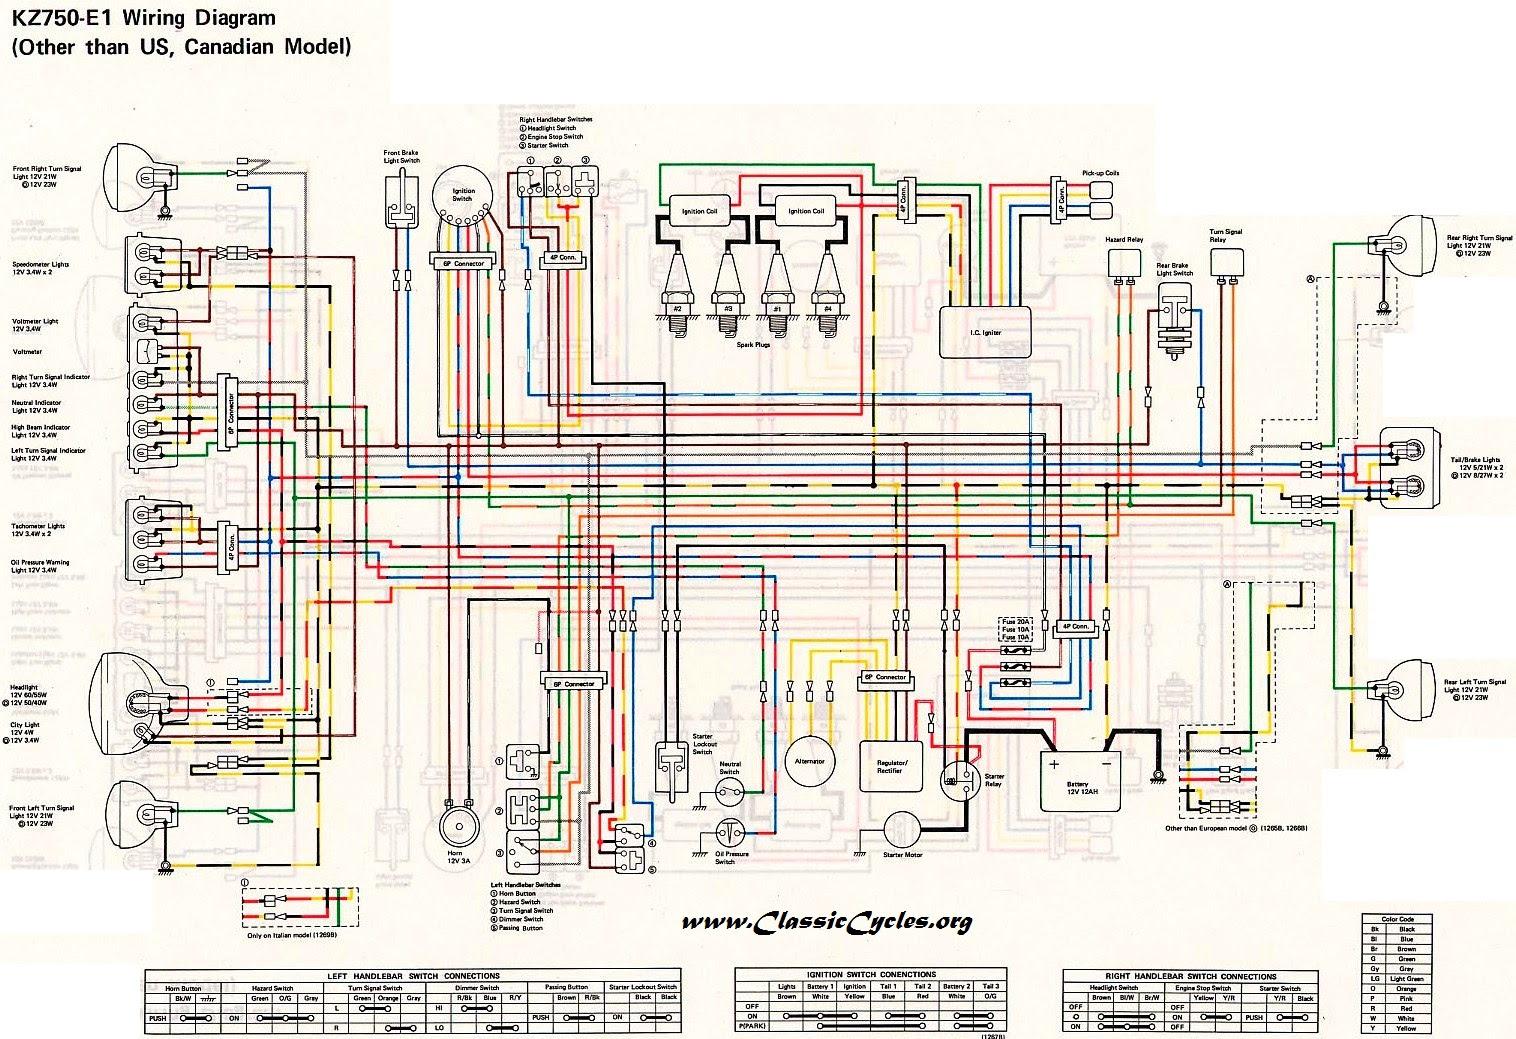 1993 Kawasaki Ninja Ex500 Wiring Diagram - Wiring Diagram ...